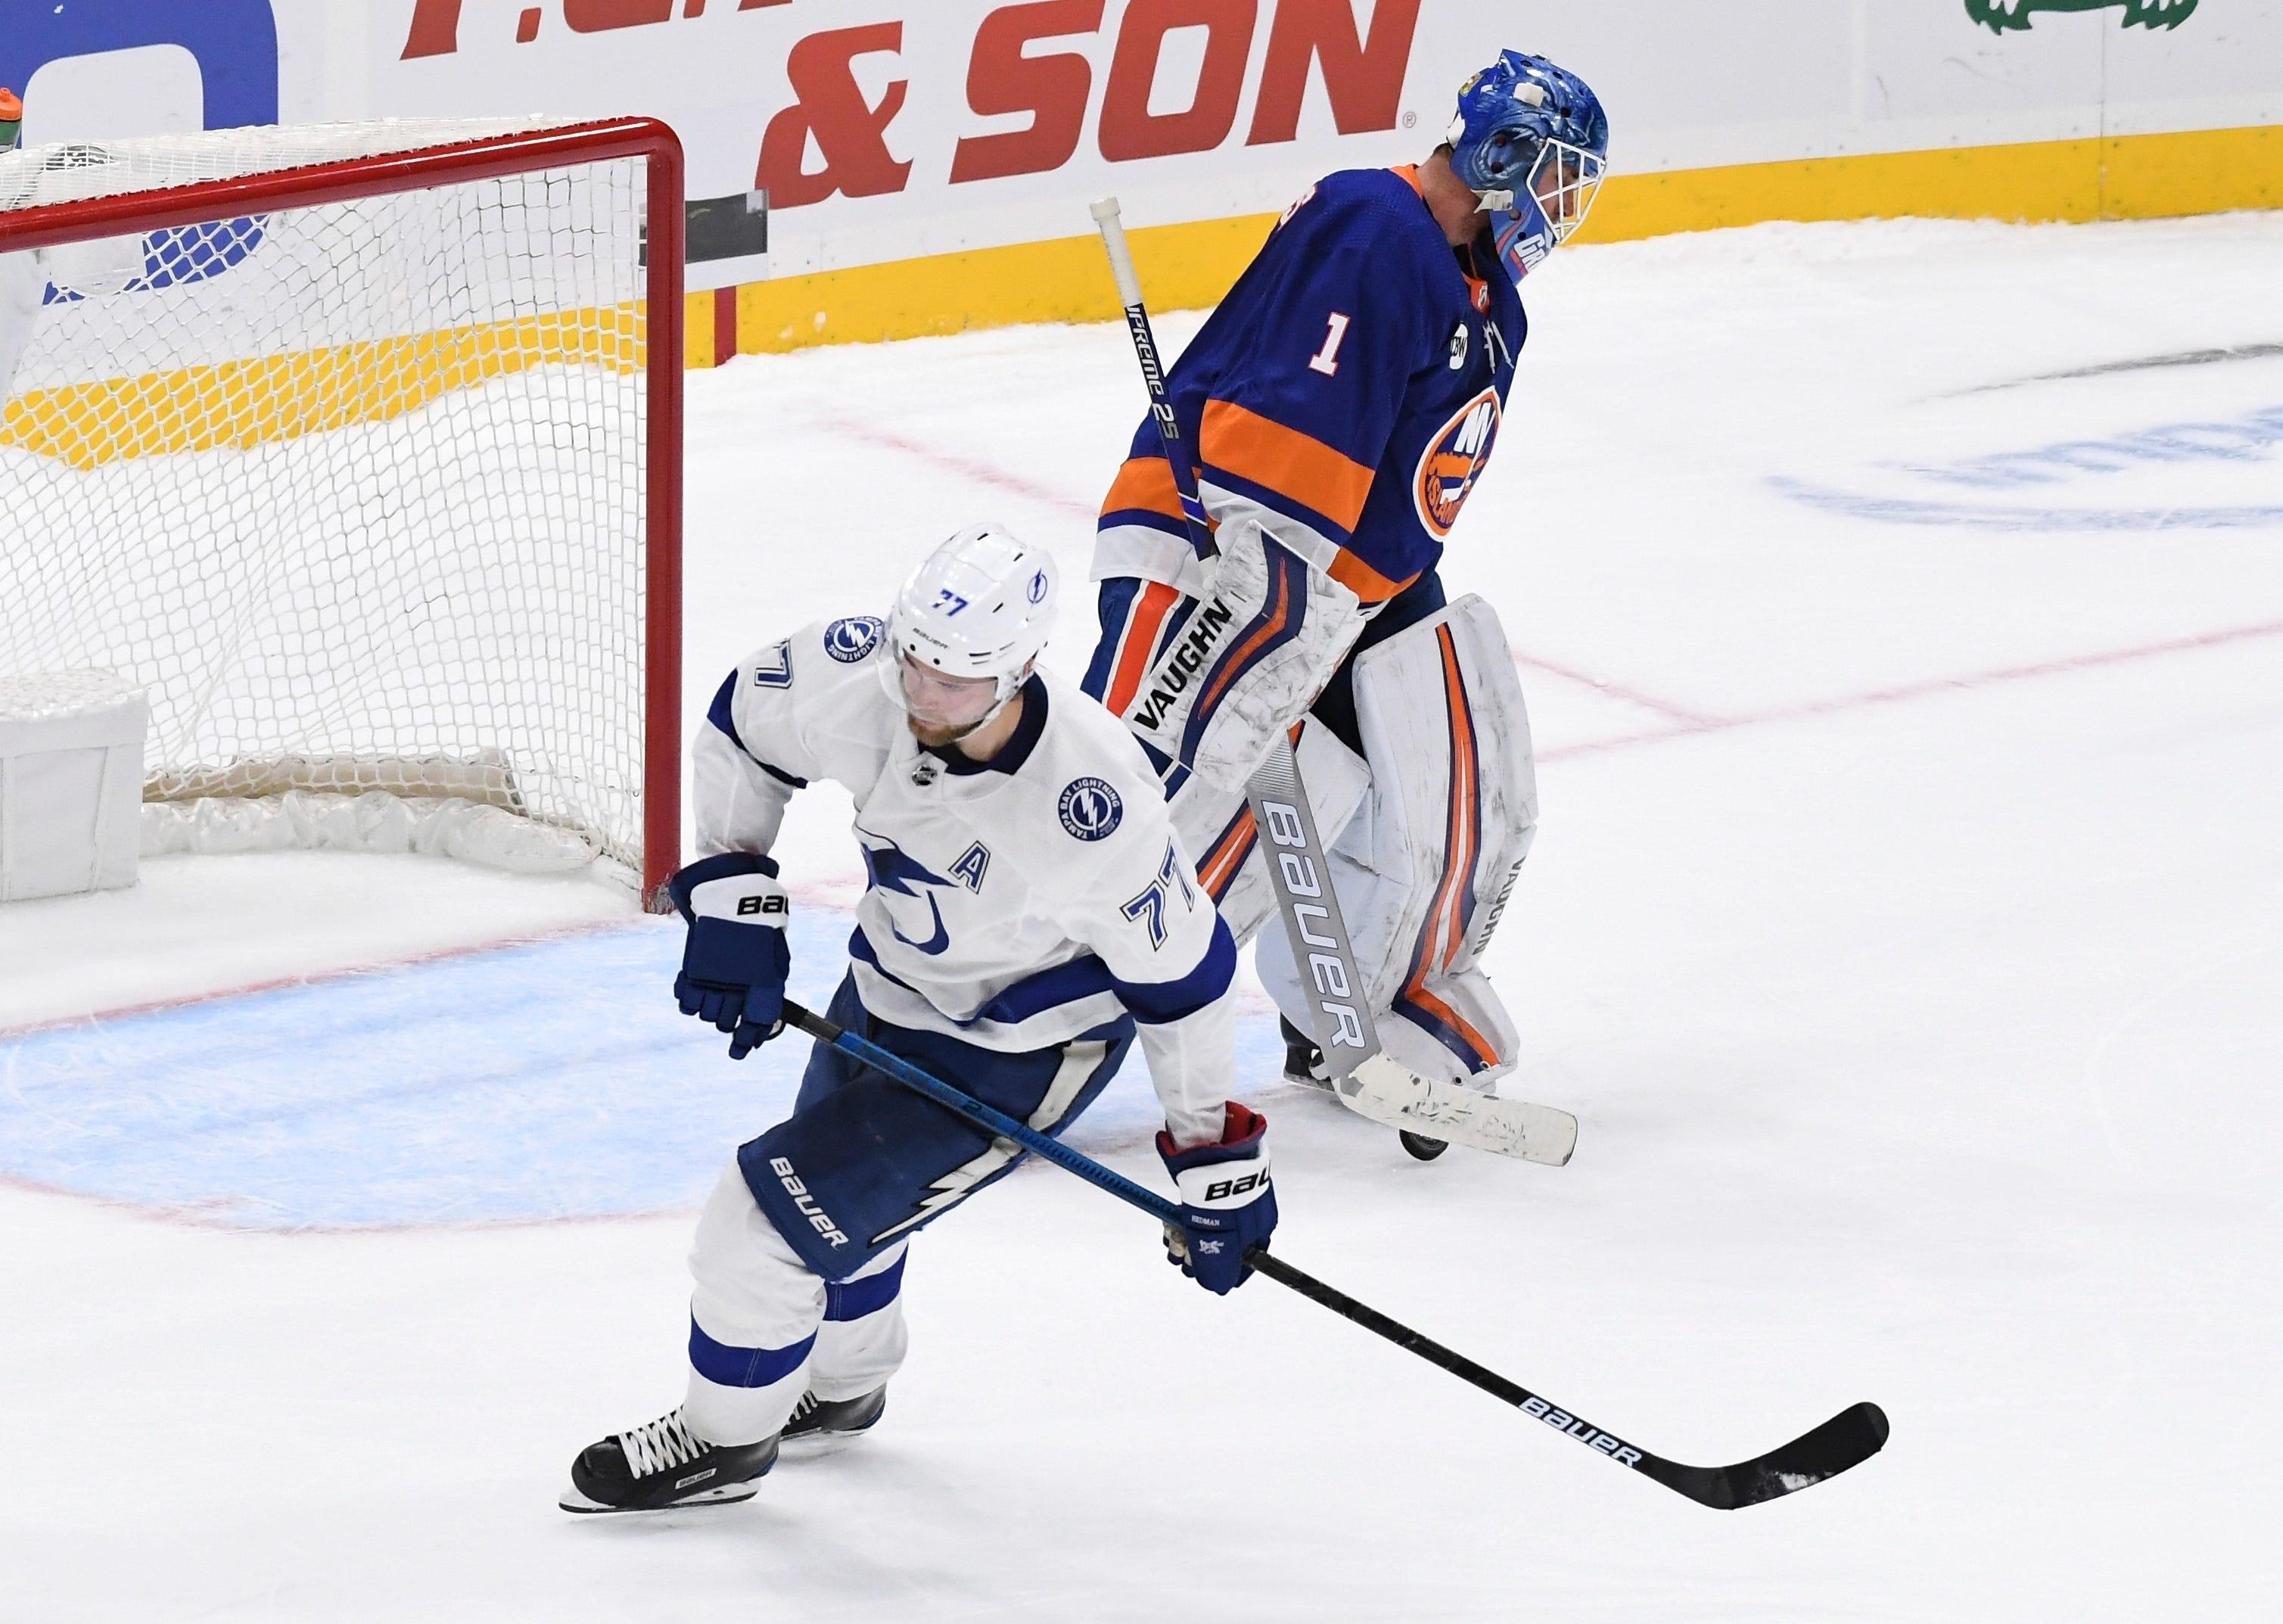 Lightning top Islanders 1-0 in shootout after goalies shine